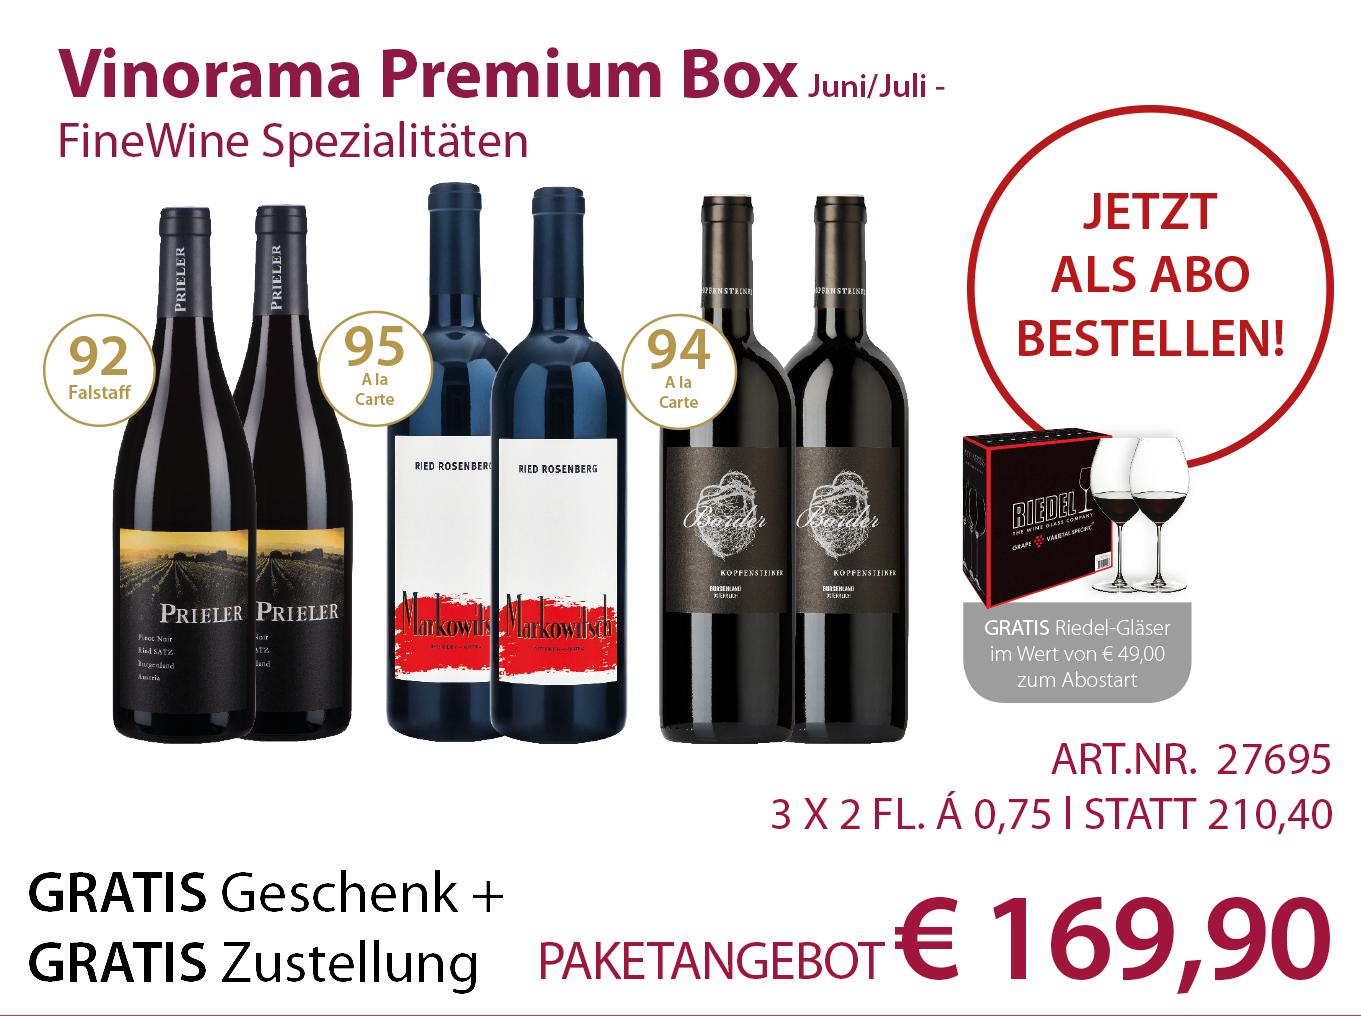 Vinorama Premium Box Abo